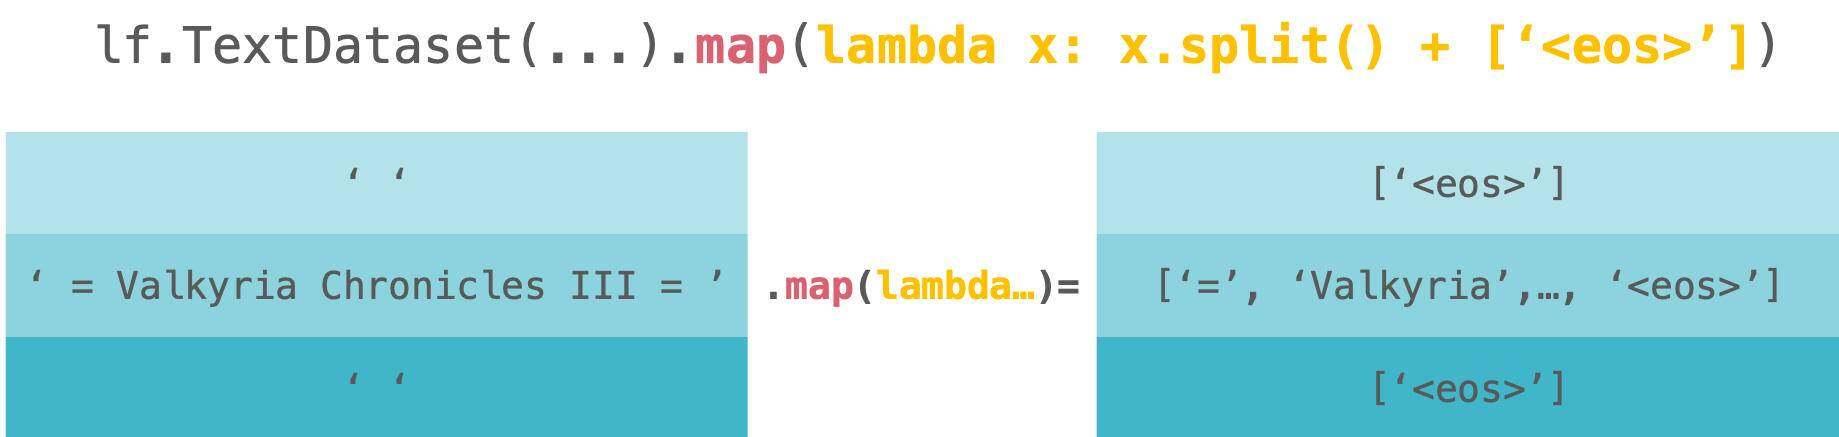 LineFlow开源:比PyTorch简洁数倍,适用任何框架的NLP数据集处理程序